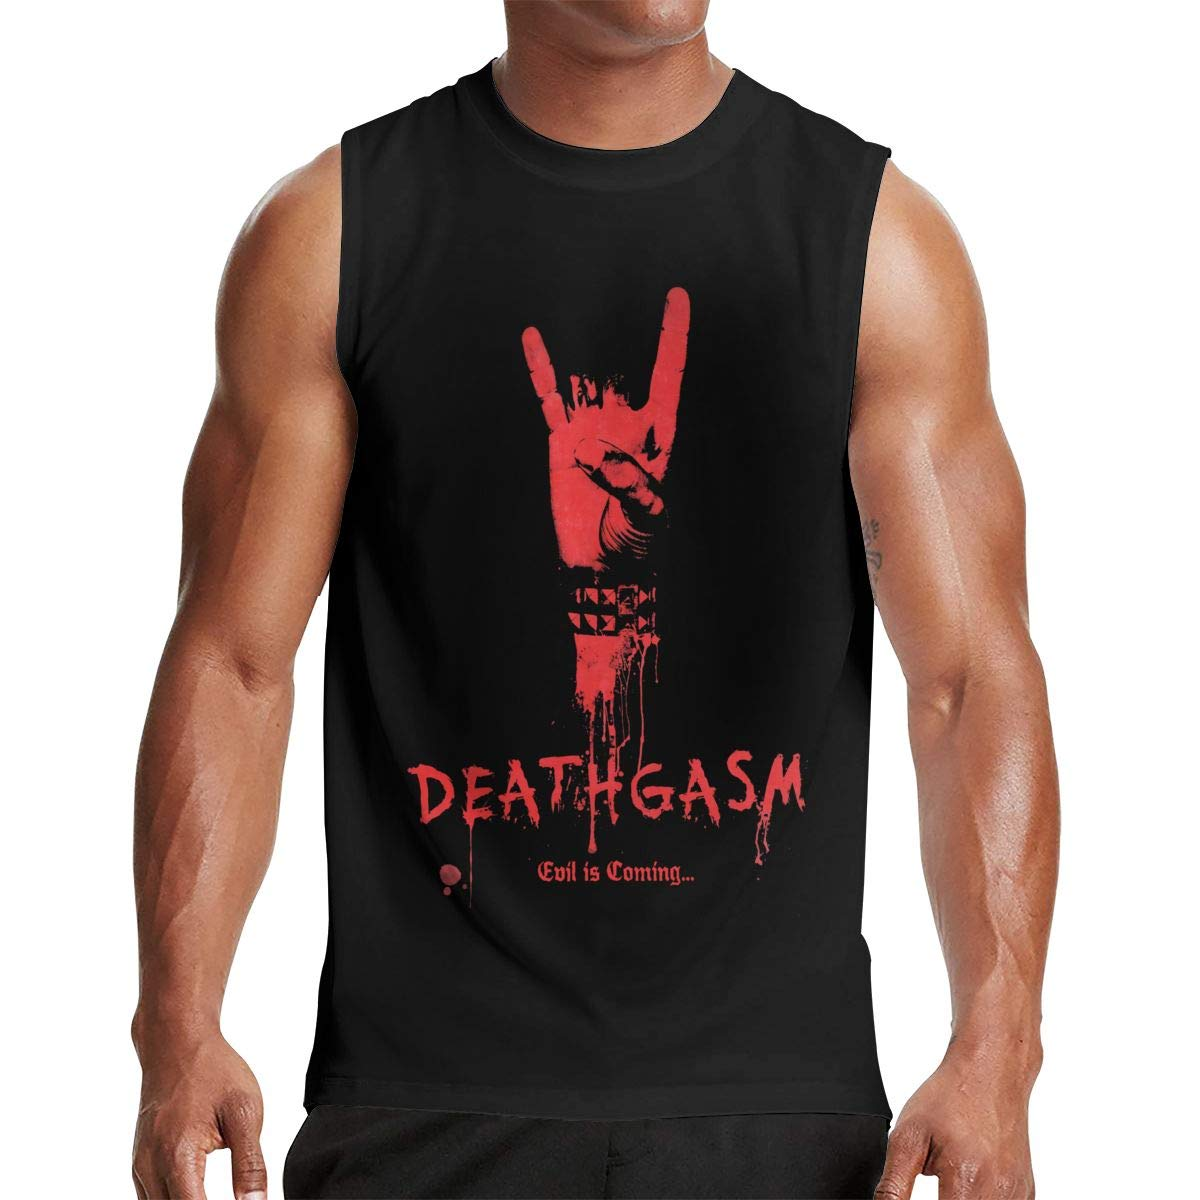 Thomlarryca Deathgasm S Gym Muscle T Shirt Classic Athletic Sleeveless T Shirts Black